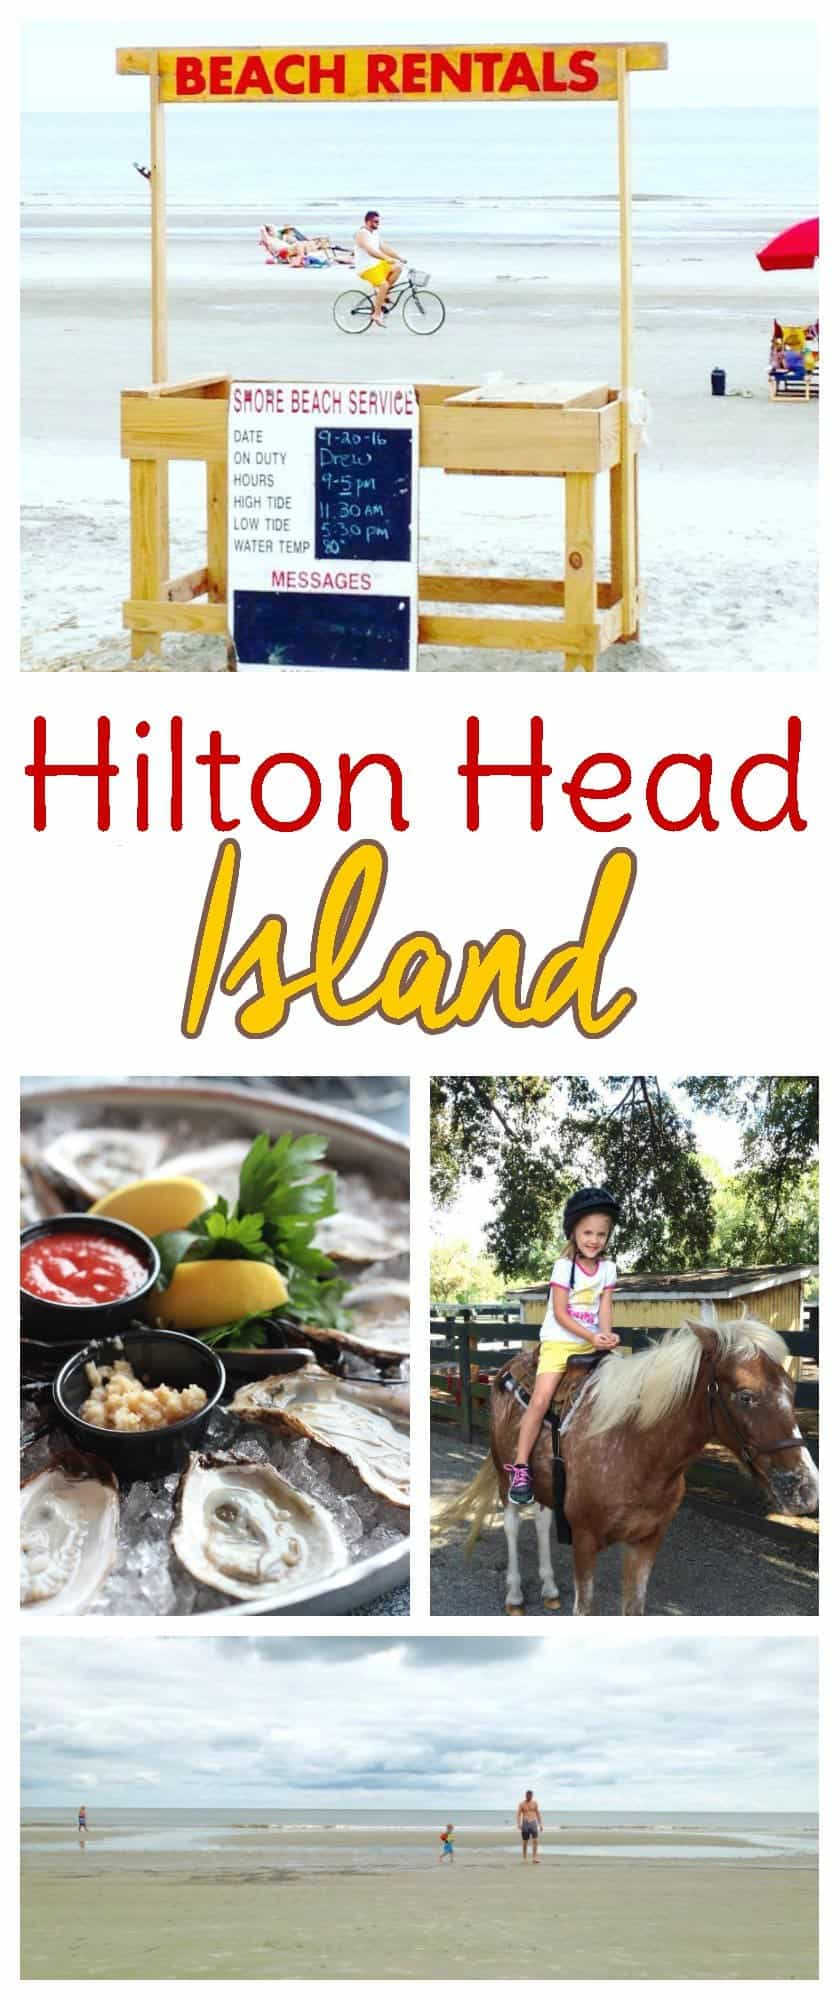 Travel tips when visiting Hilton Head Island, South Carolina as a family vacation destination